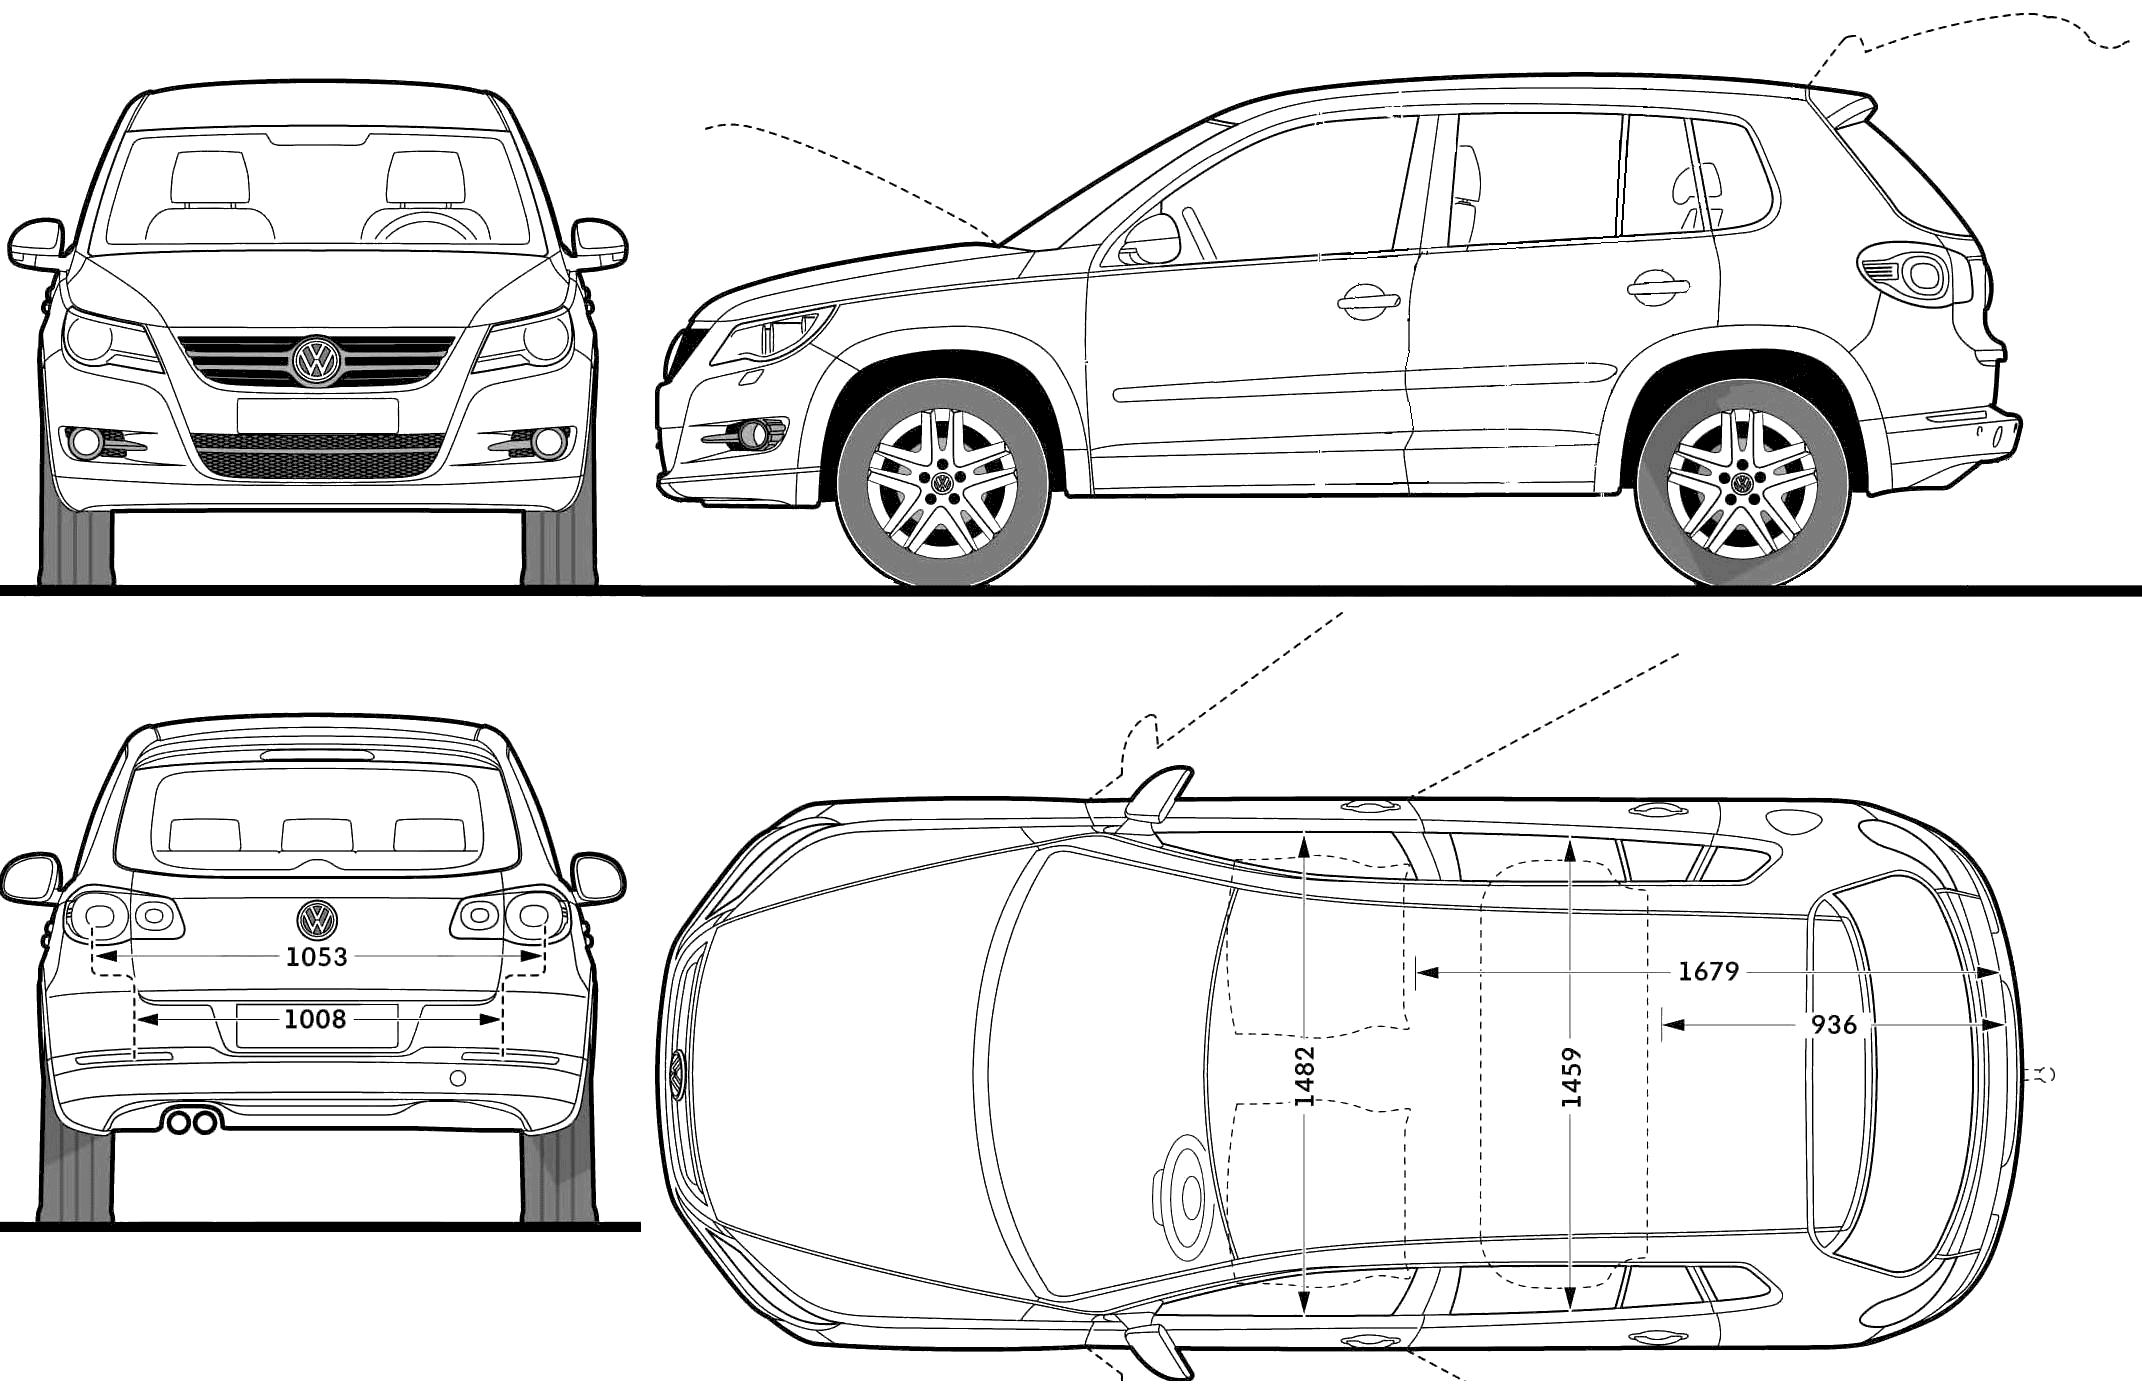 Volkswagen Tiguan Trend 2008 on 2016 Kia Sportage Suv